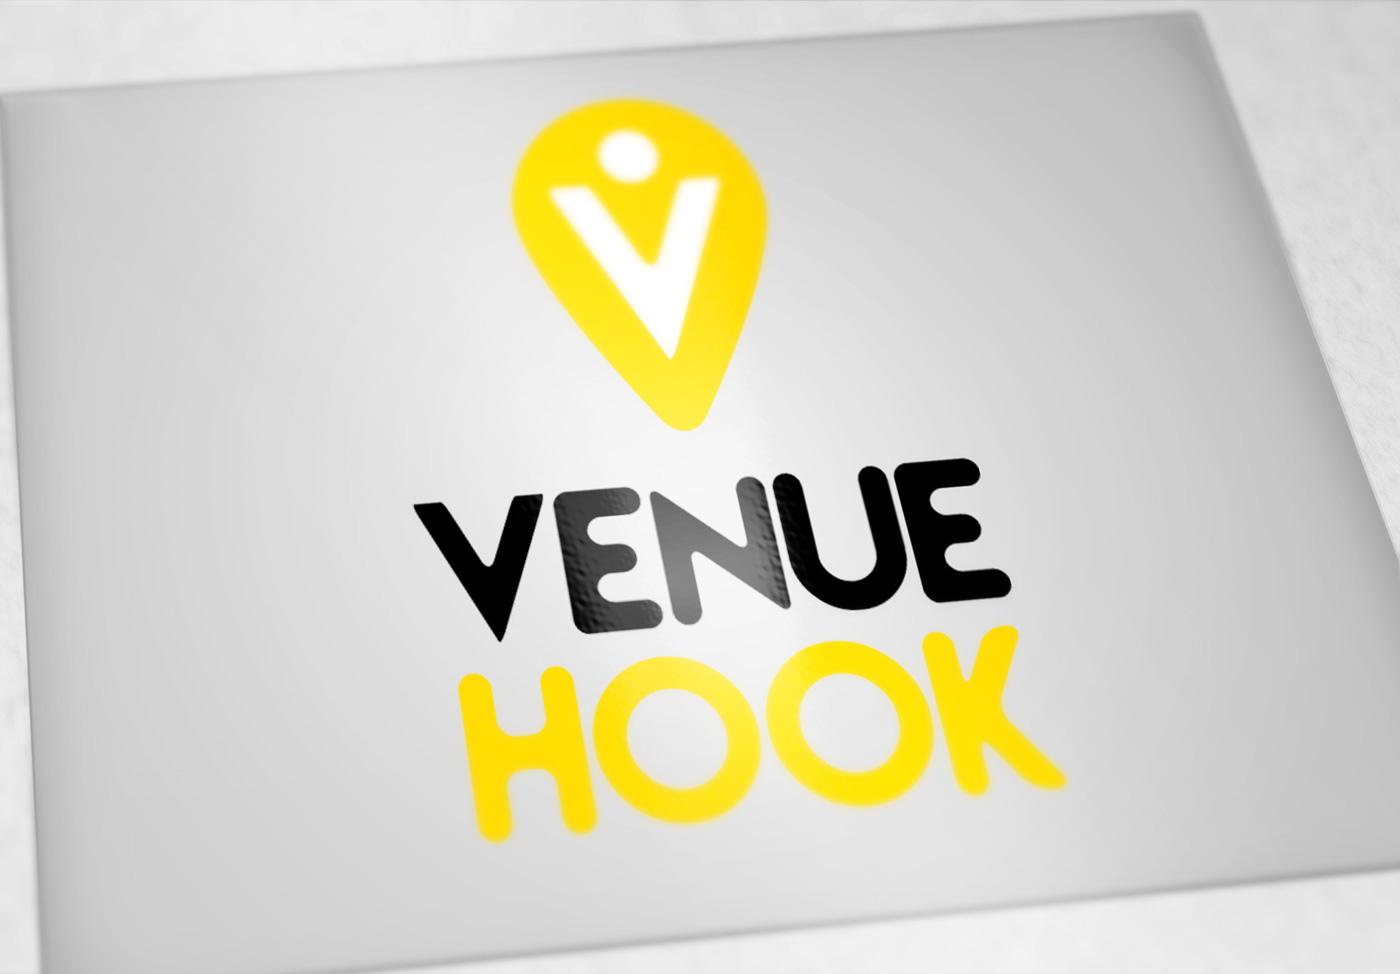 graphic design logo brand branding  venue hook Event wedding Board